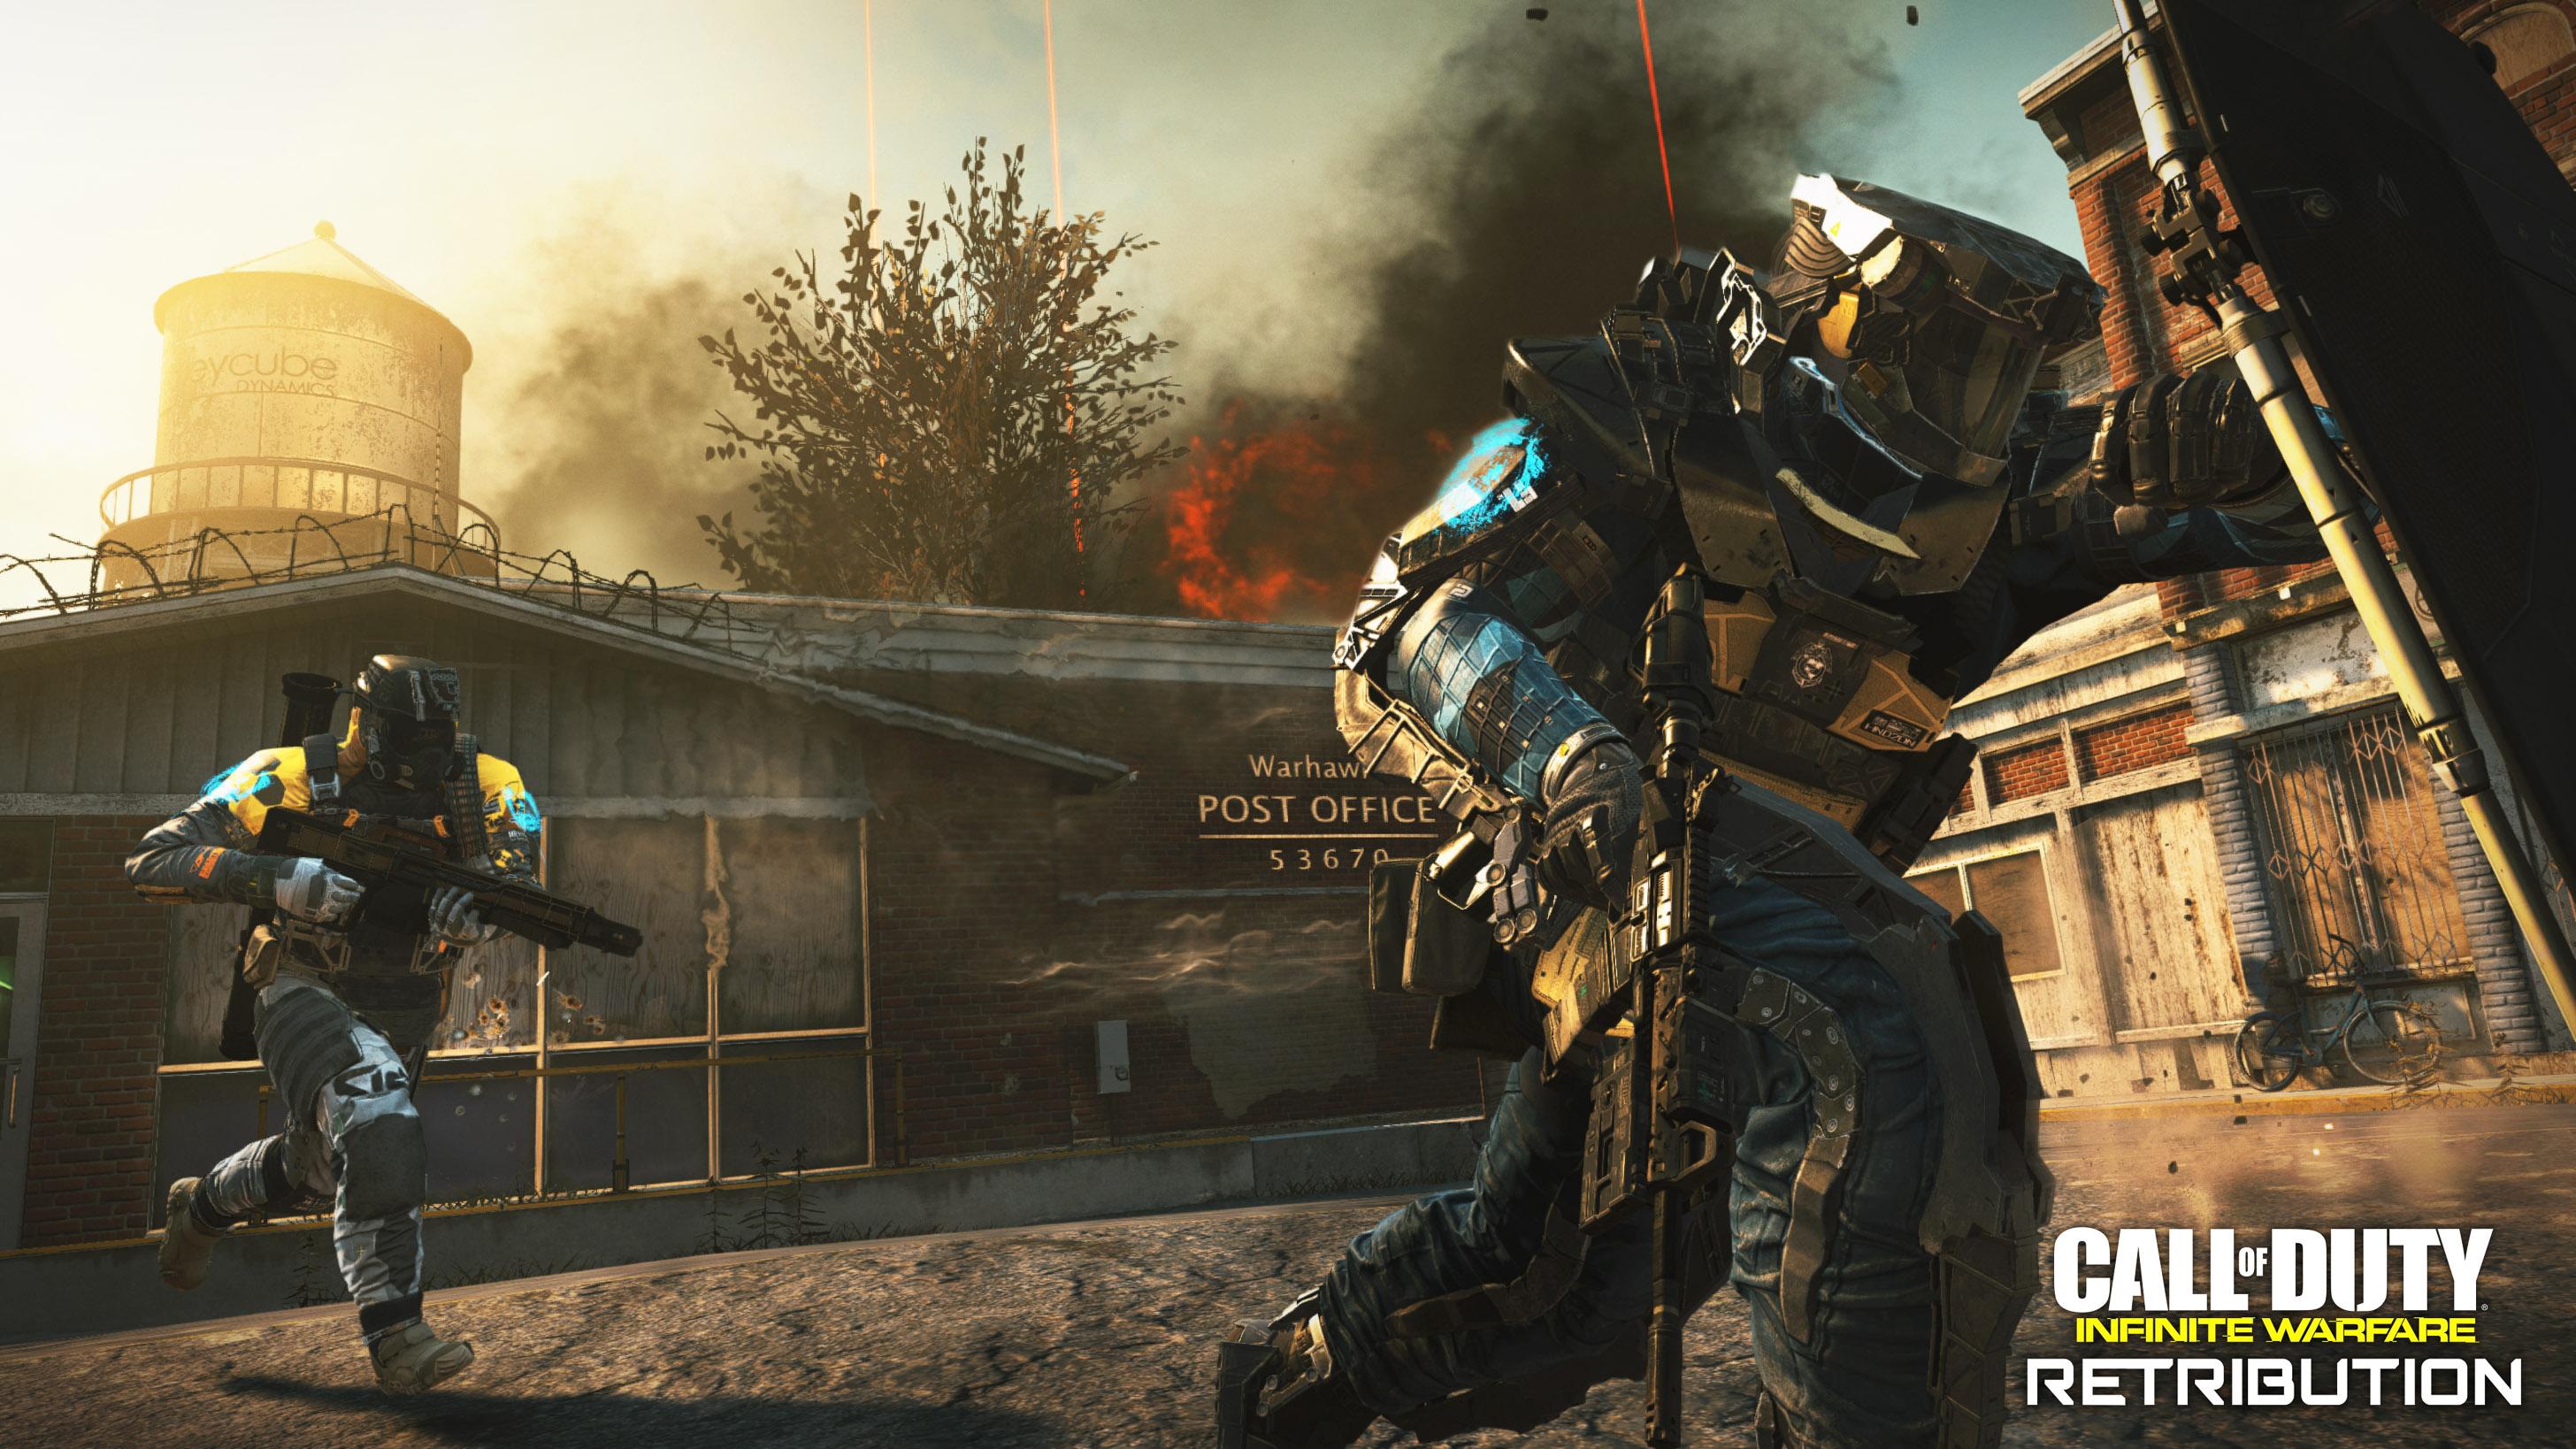 Call of Duty: Infinite Warfare Retribution DLC